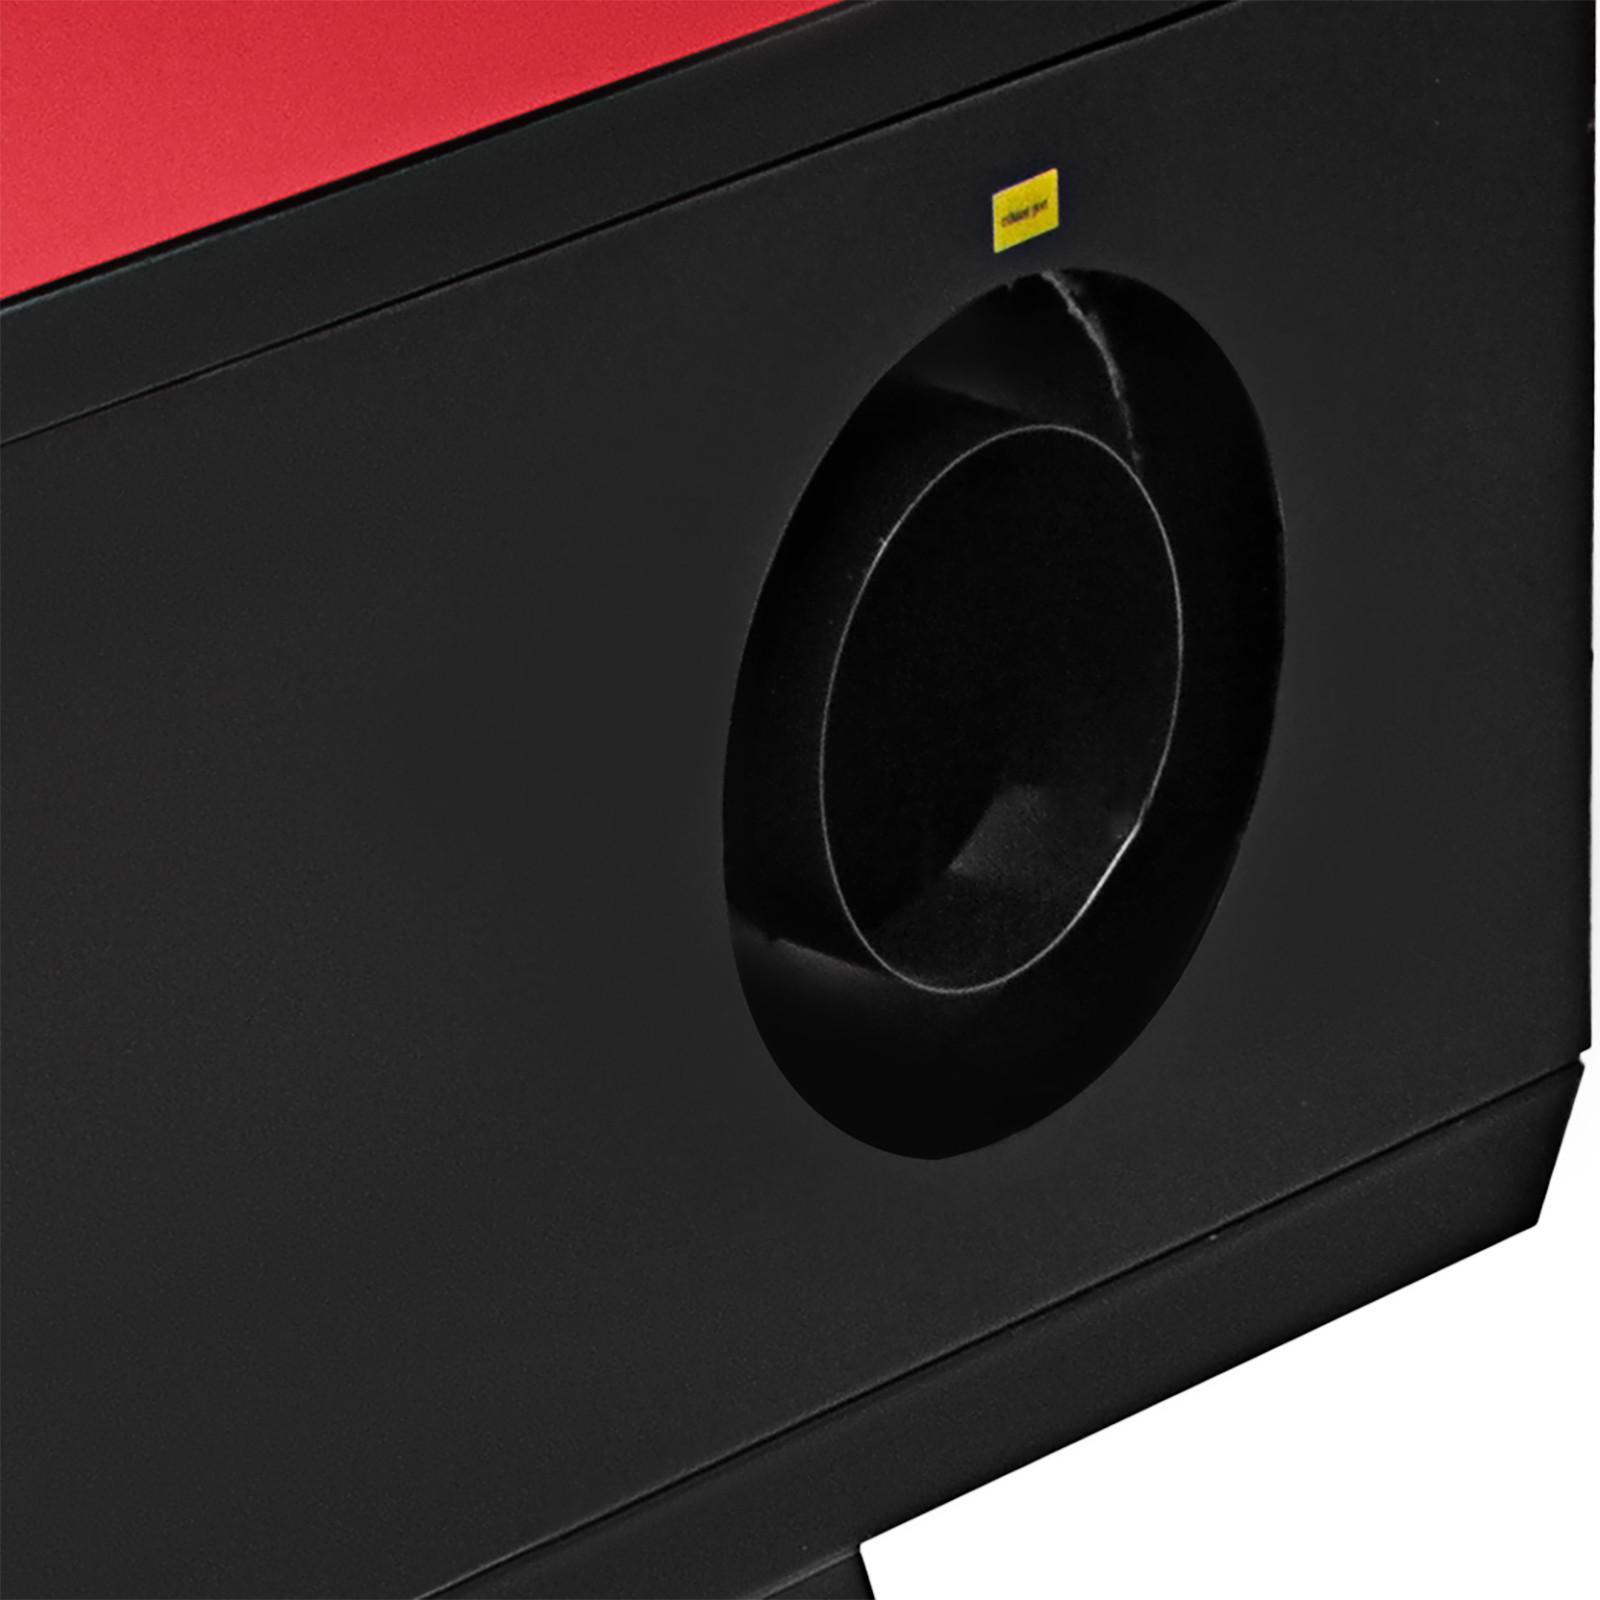 Macchina-per-Incisione-Laser-CO2-40-130W-Asse-Rotante-Tagliatrice-Incisore miniatura 58